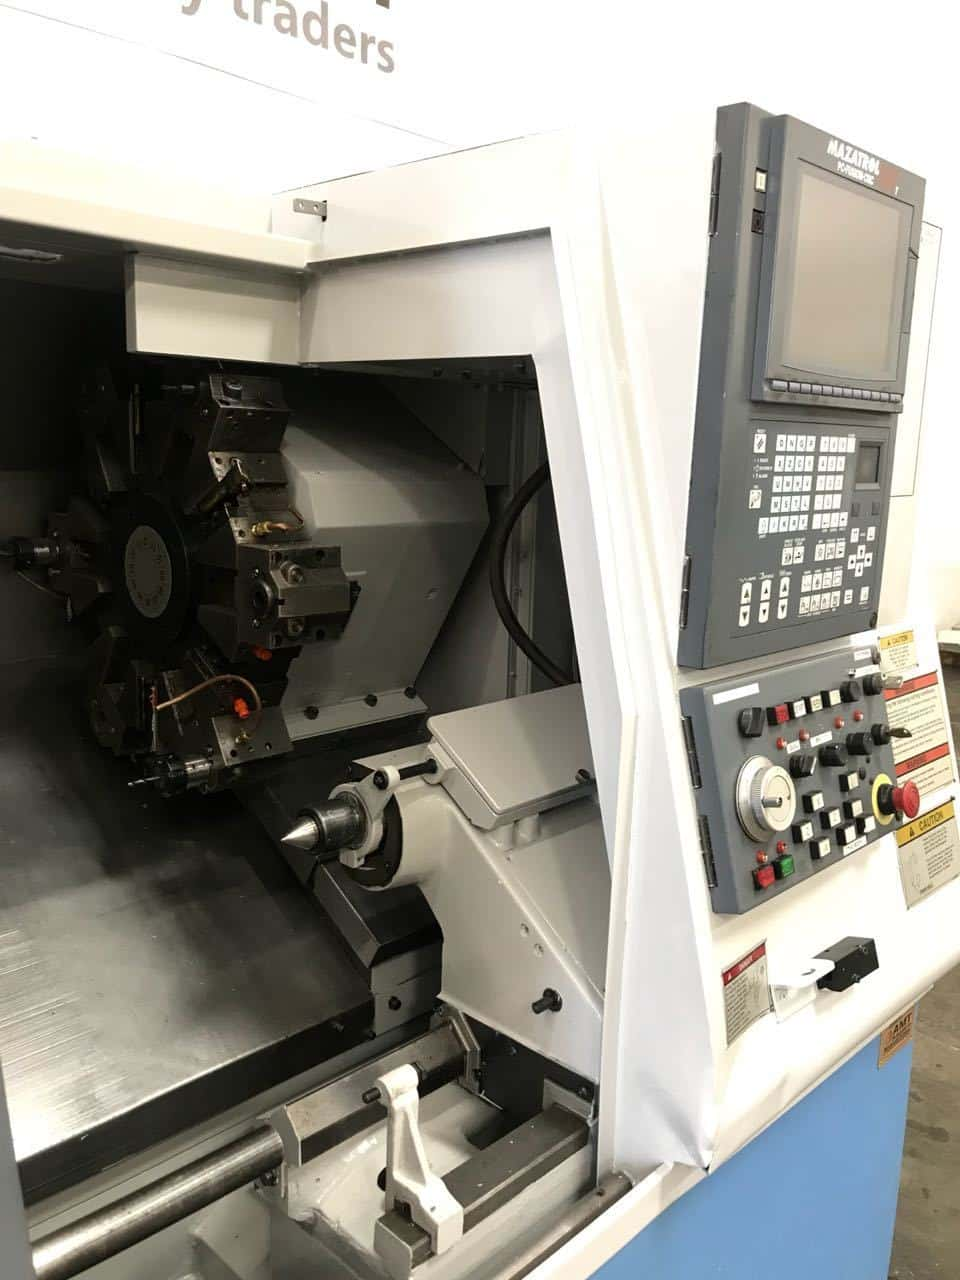 Mazak Quick Turn QT-250 CNC Turning Center - MachineStation